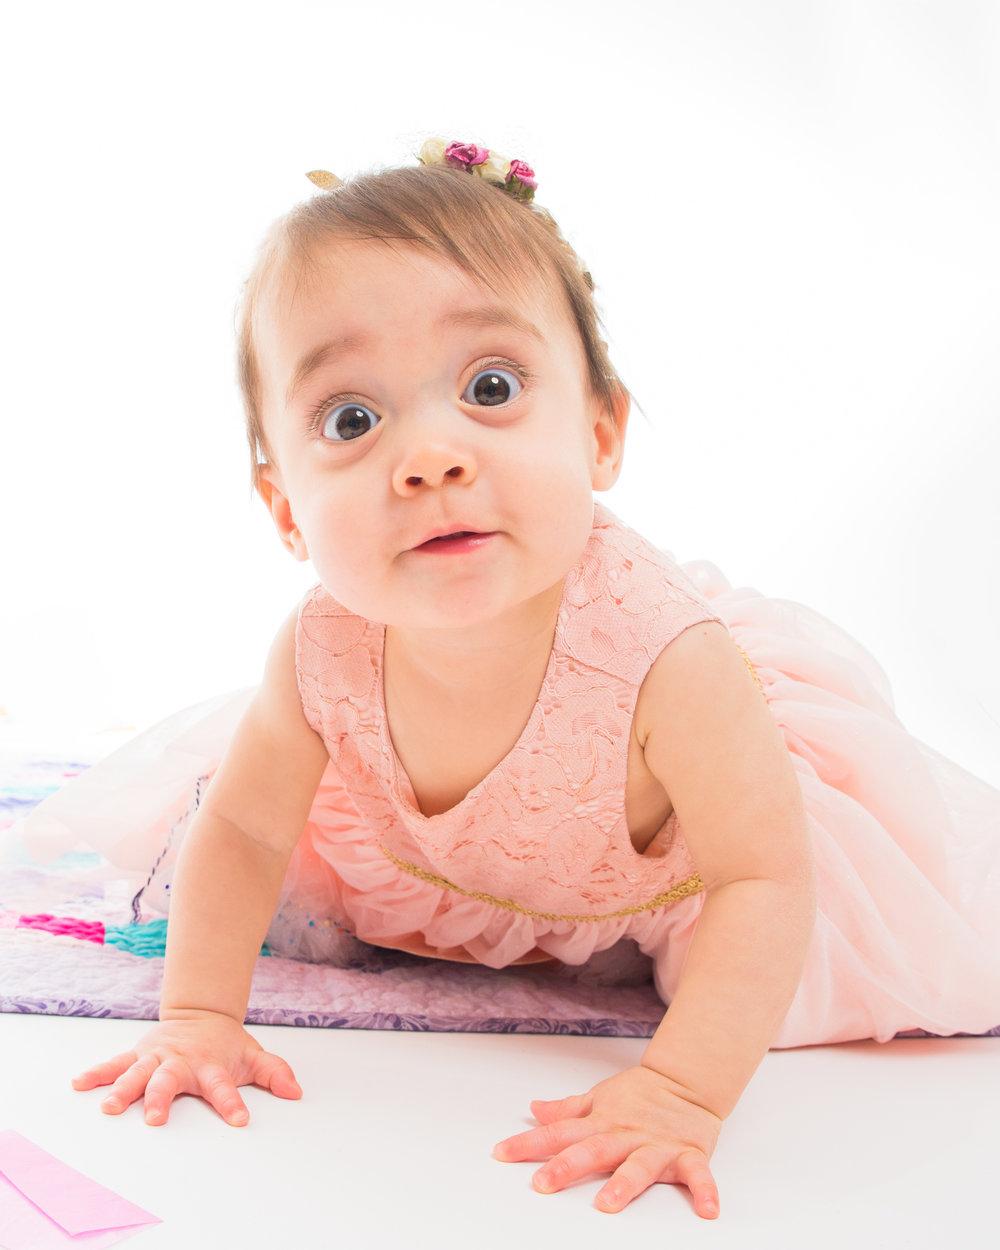 2018_February_04-Veronica_Sullivan_One_Year_Baby_Pics-44857-Edit.jpg